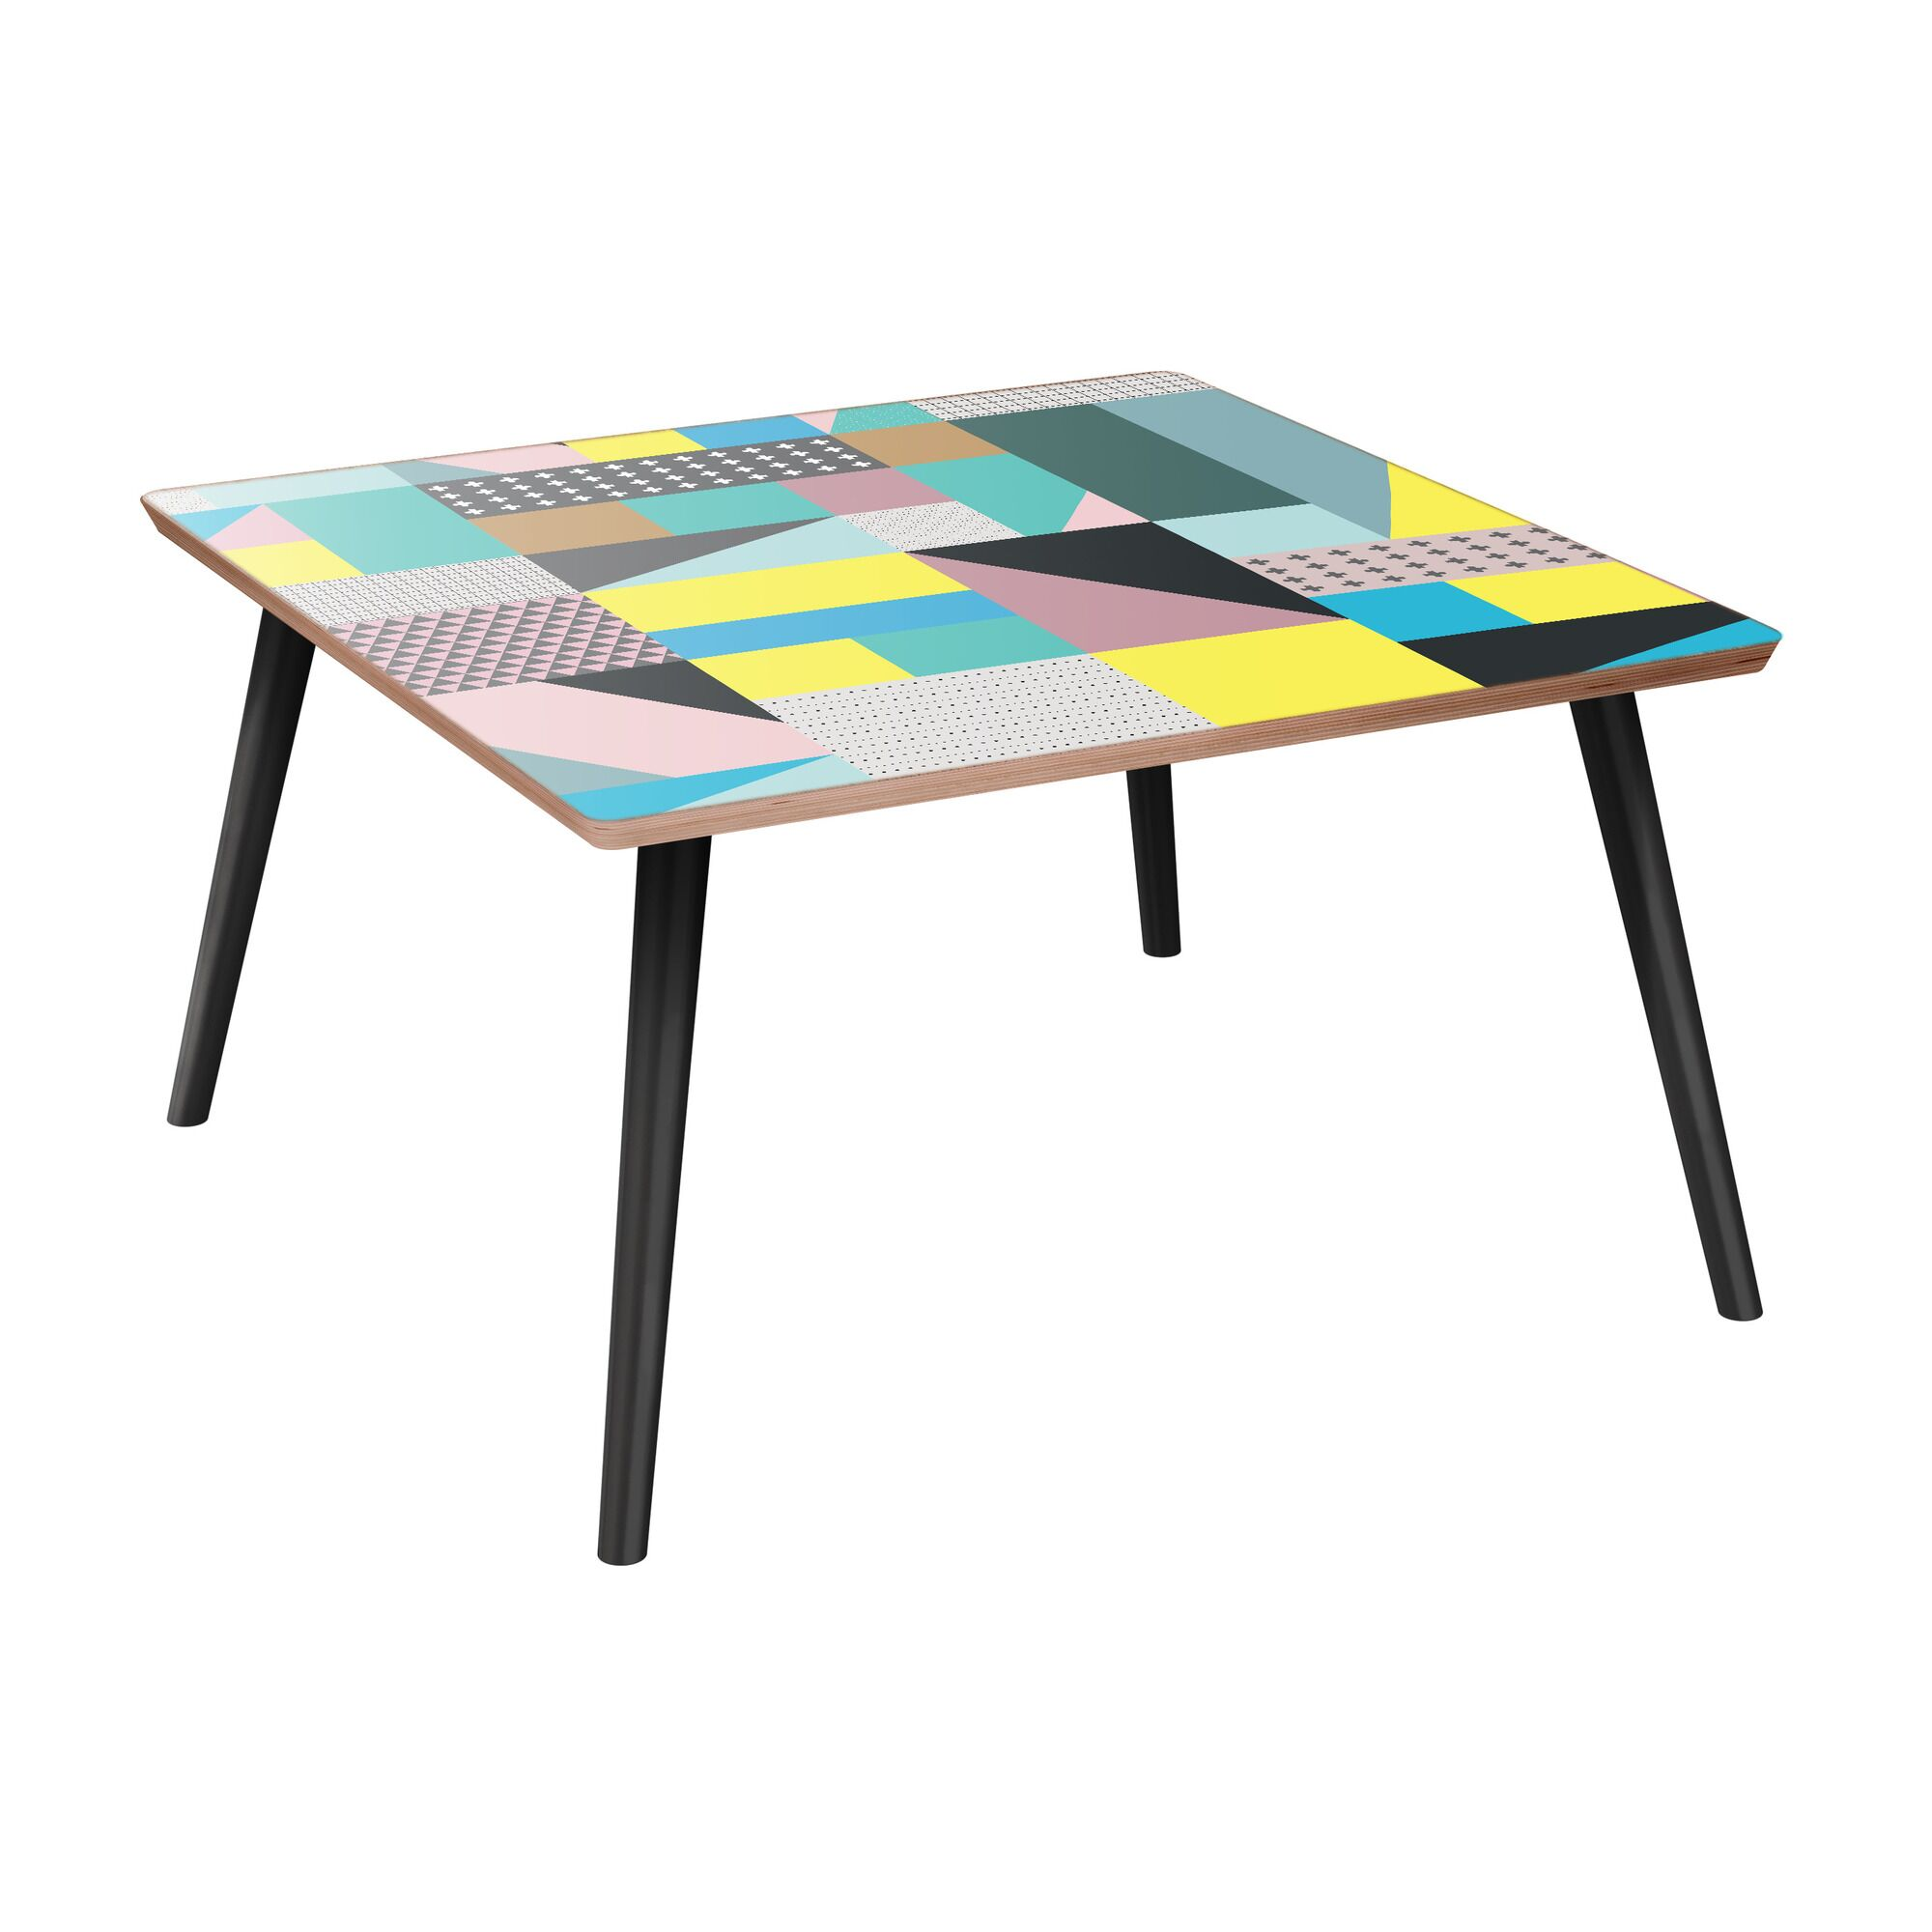 Joya Coffee Table Table Base Color: Black, Table Top Color: Walnut